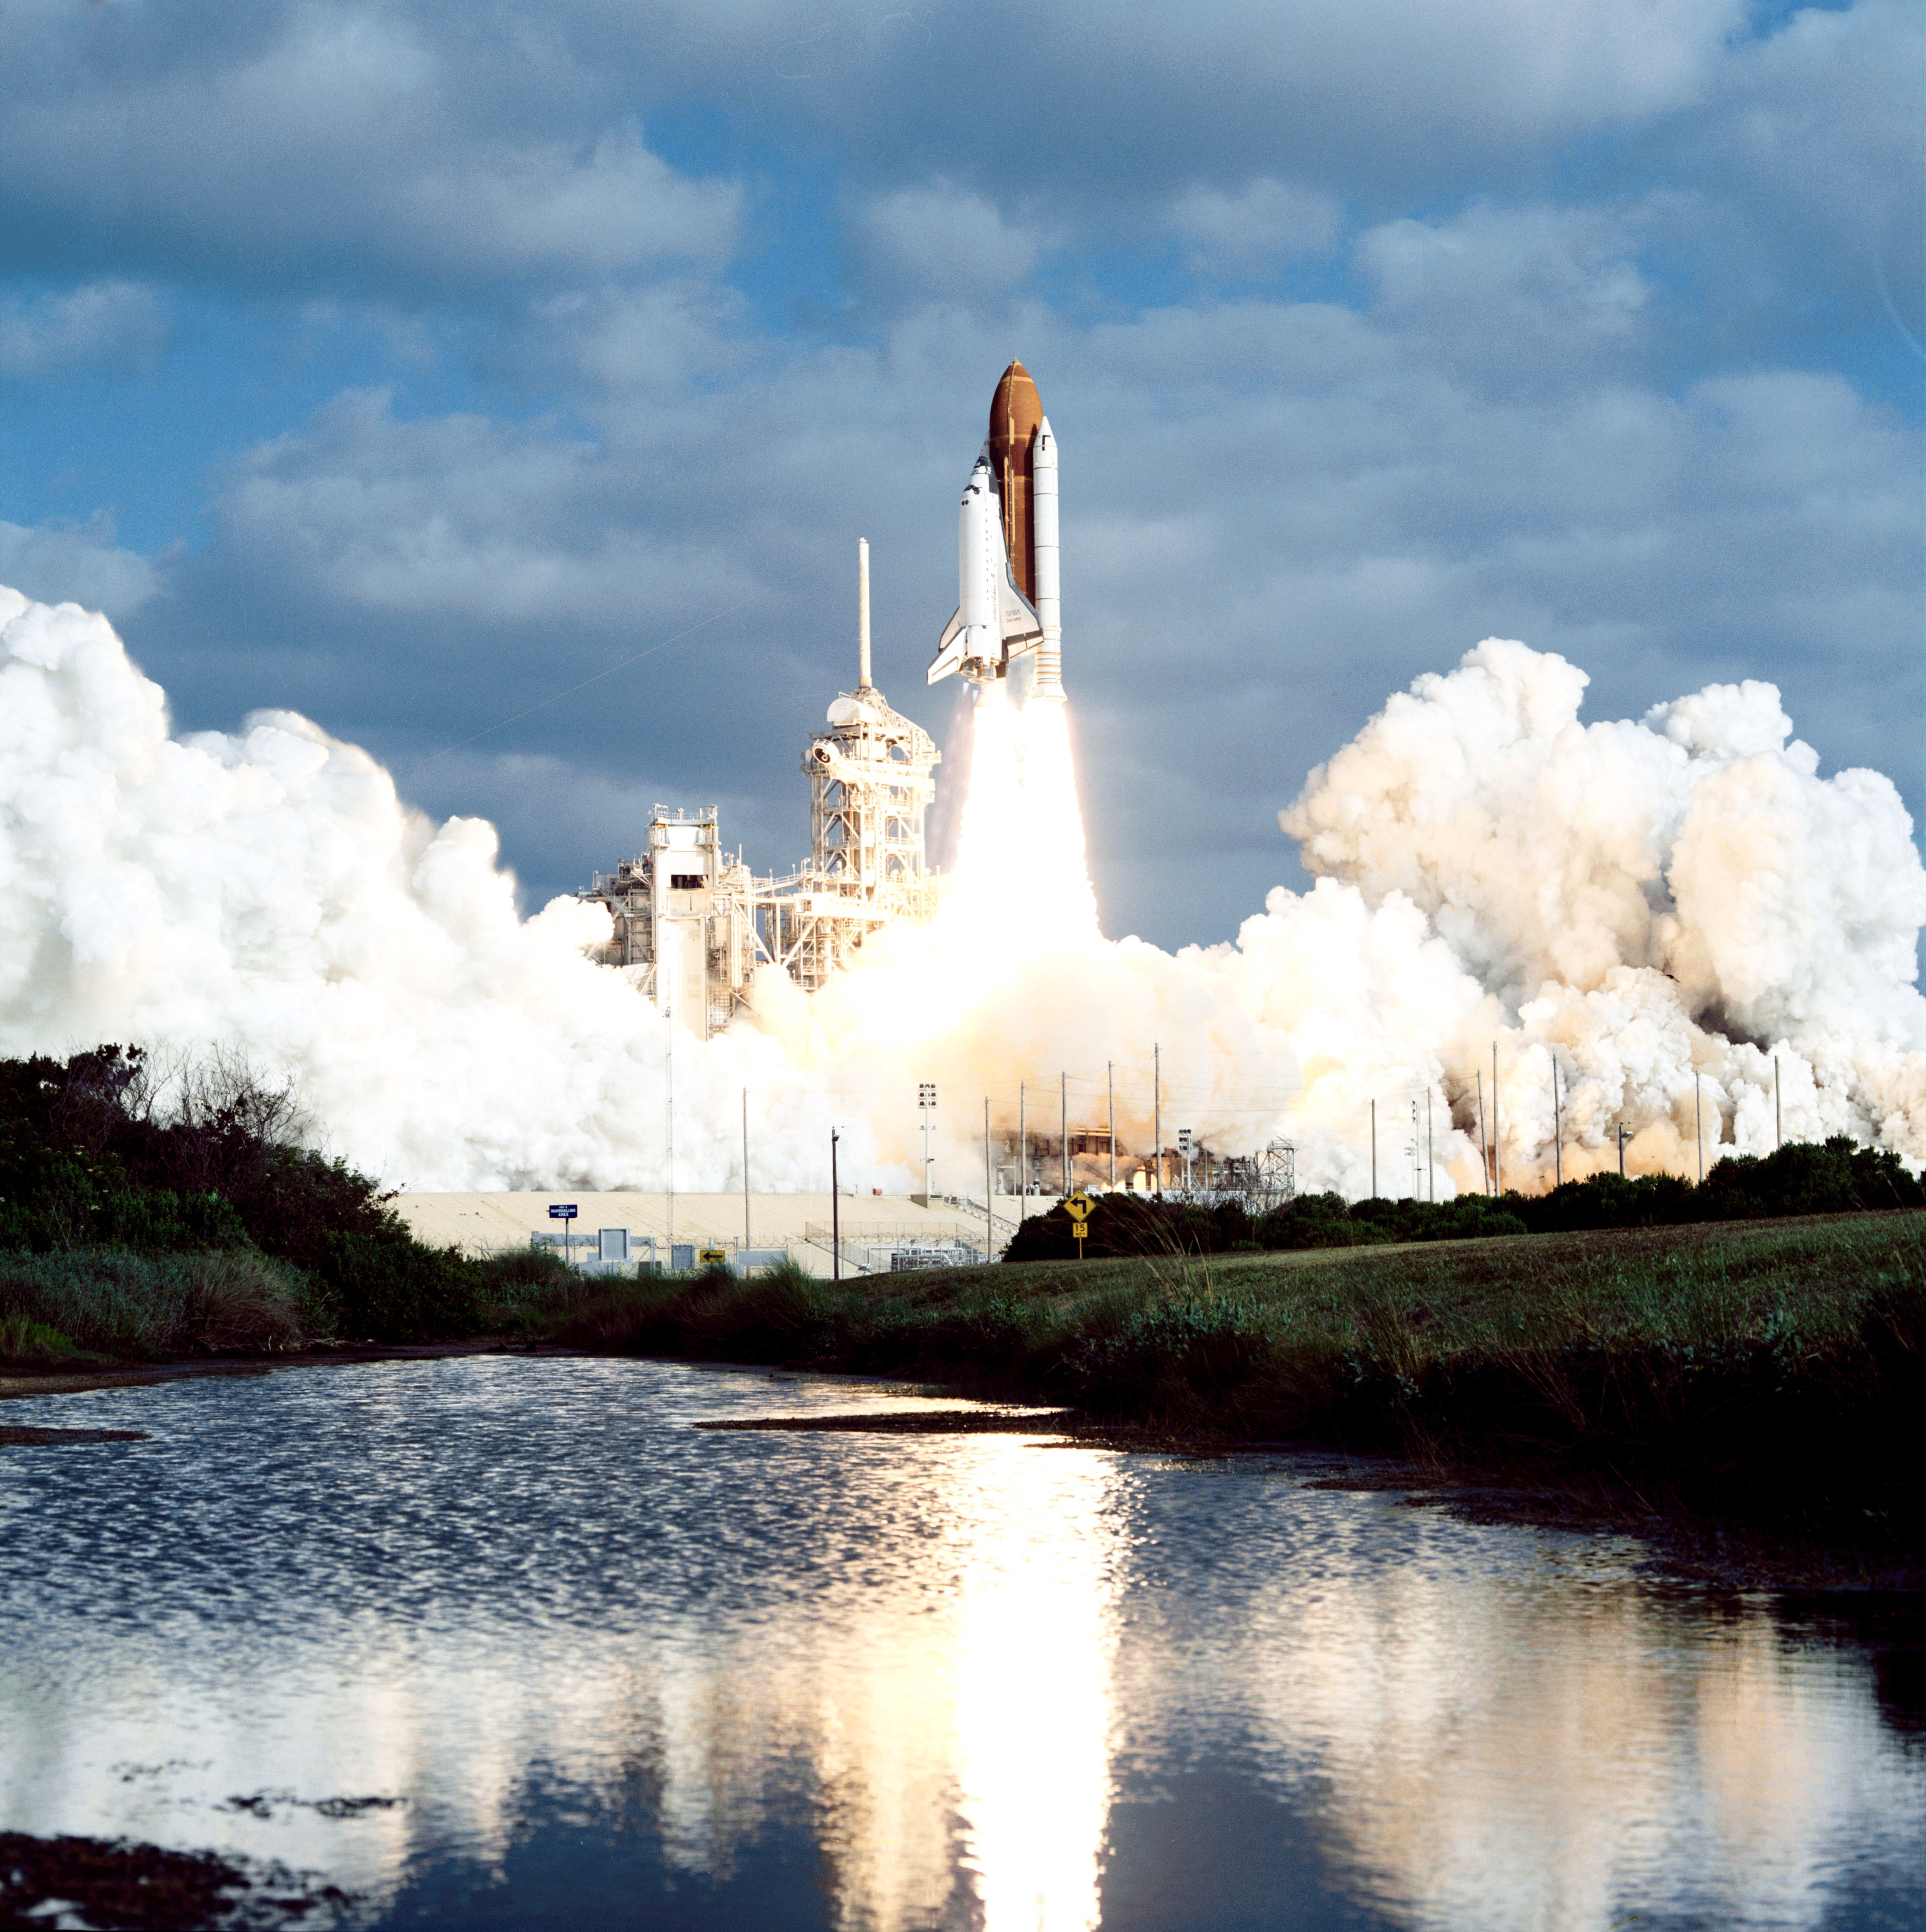 NASA's Kennedy Space Center Celebrates Hubble's 25th ...